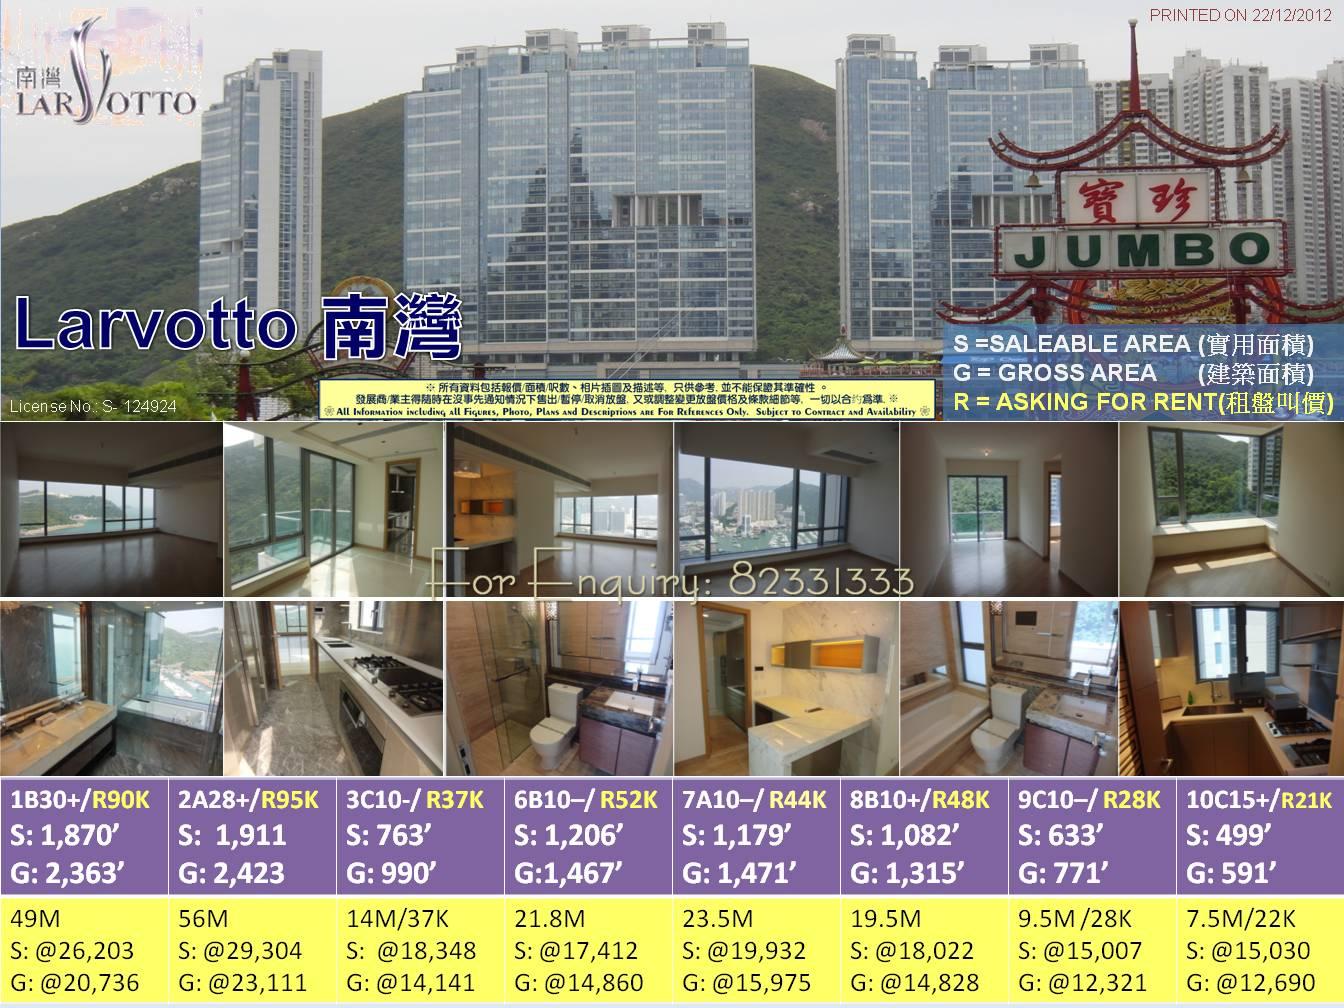 Your's Dream House Consultant - HK Lux. KLN Lux. & Property Investments Blog 香港豪宅地產藏經閣: 十二月 2012